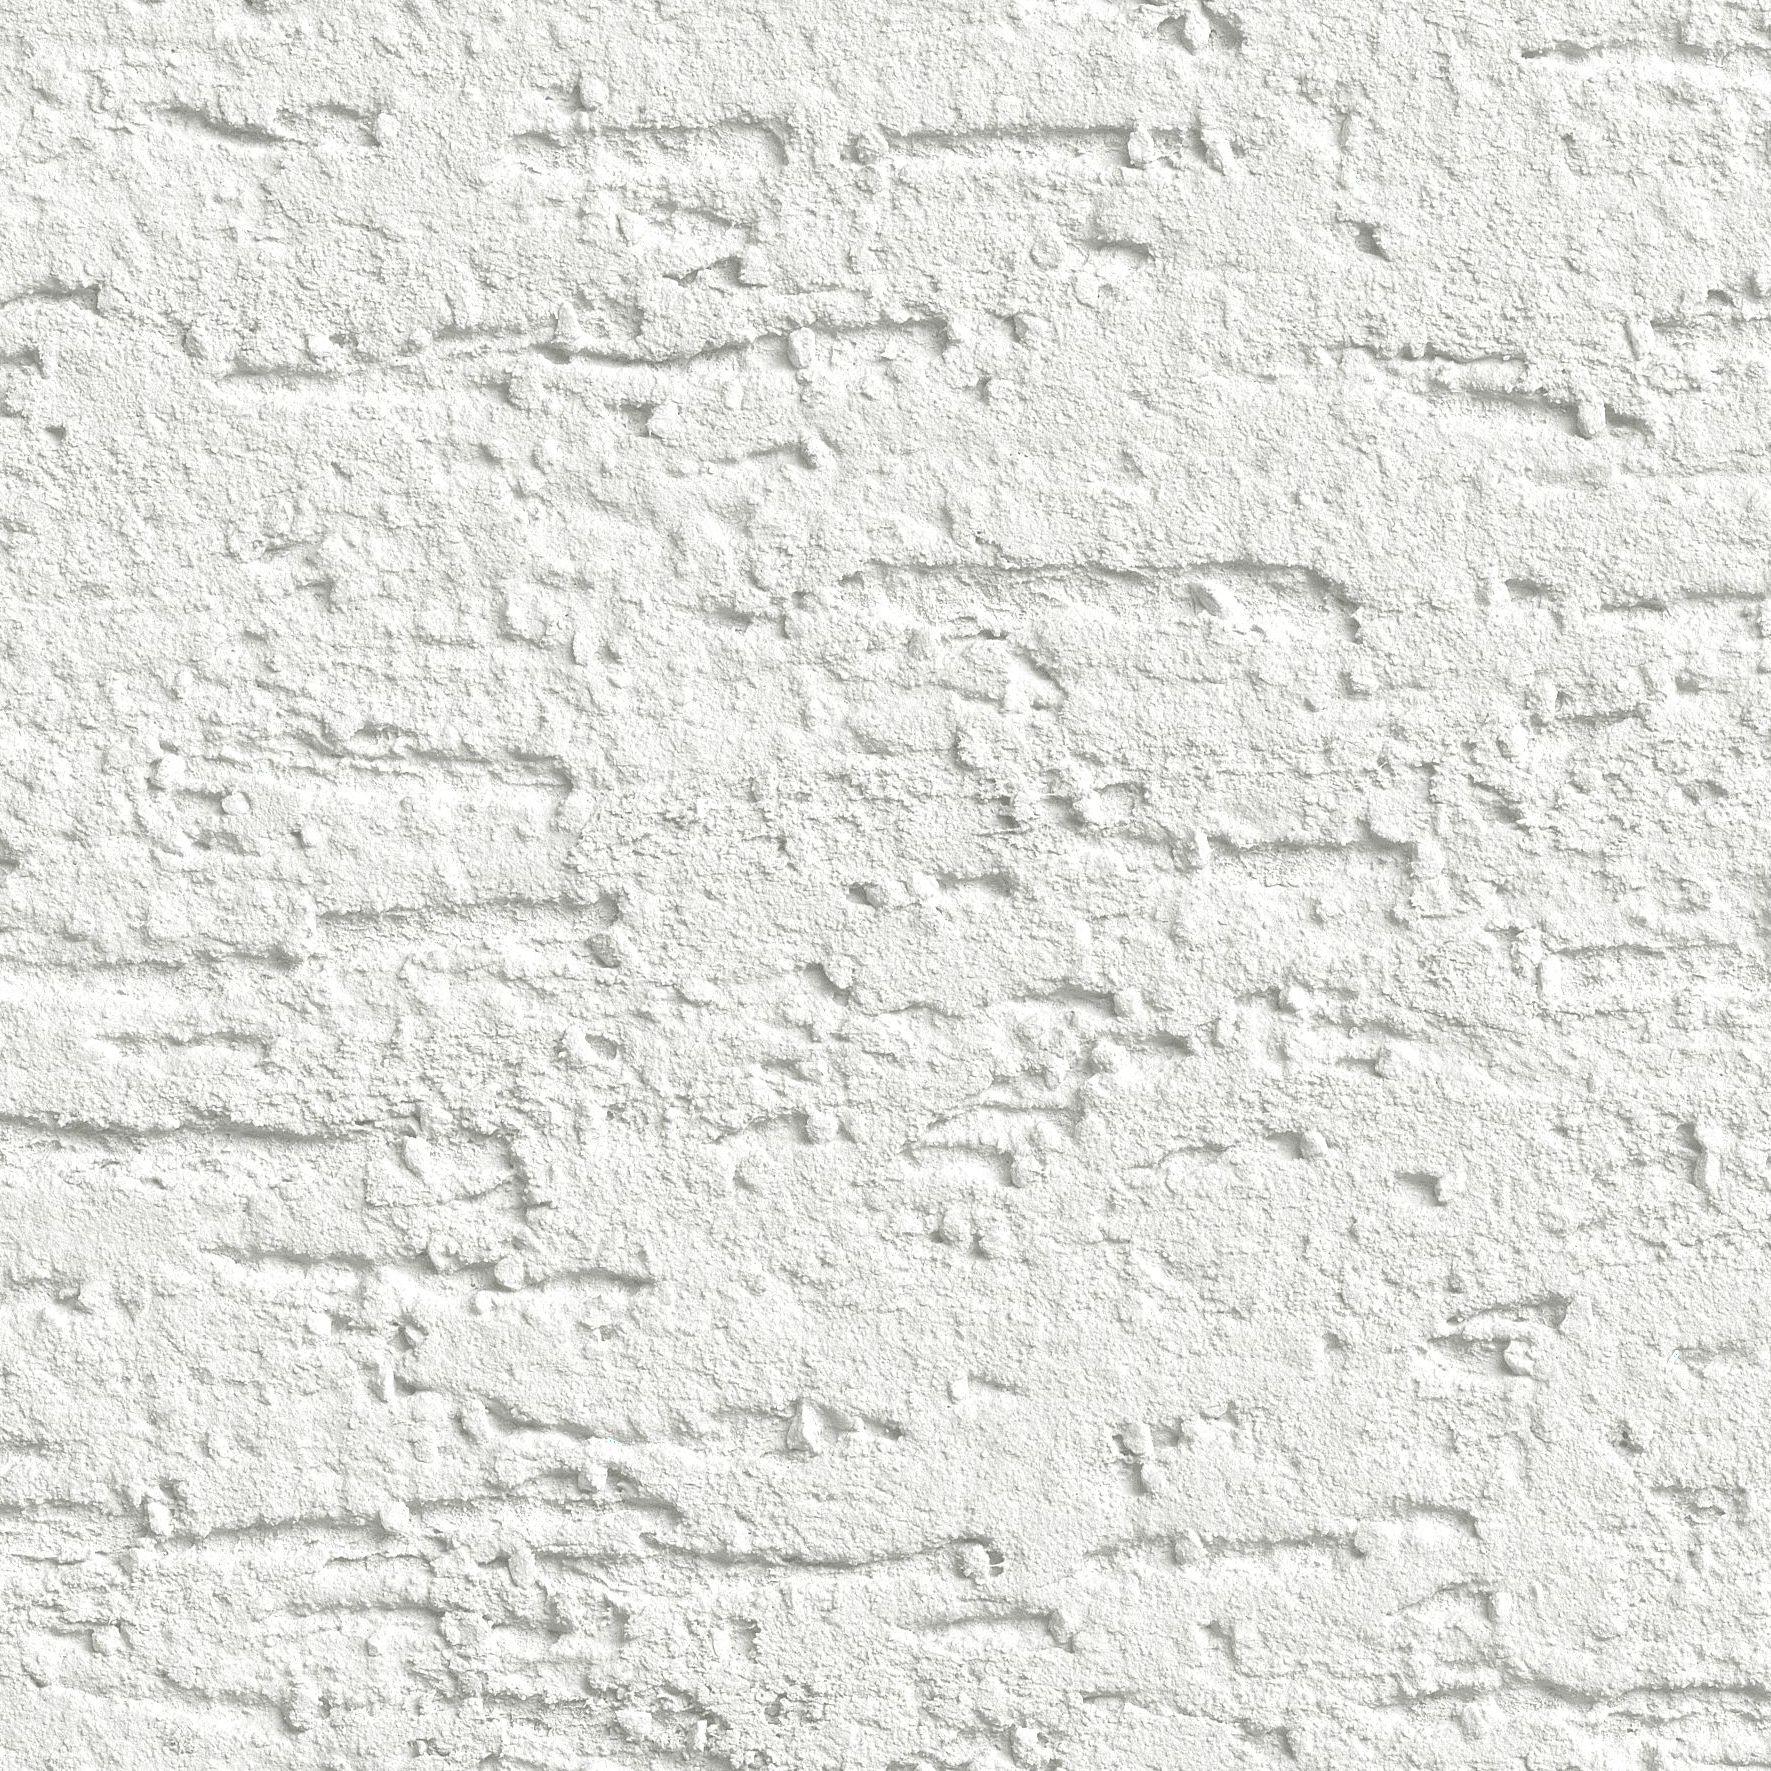 putzstrukturen strukturen aus putz strukturen informieren fassaden gestalten baumit. Black Bedroom Furniture Sets. Home Design Ideas